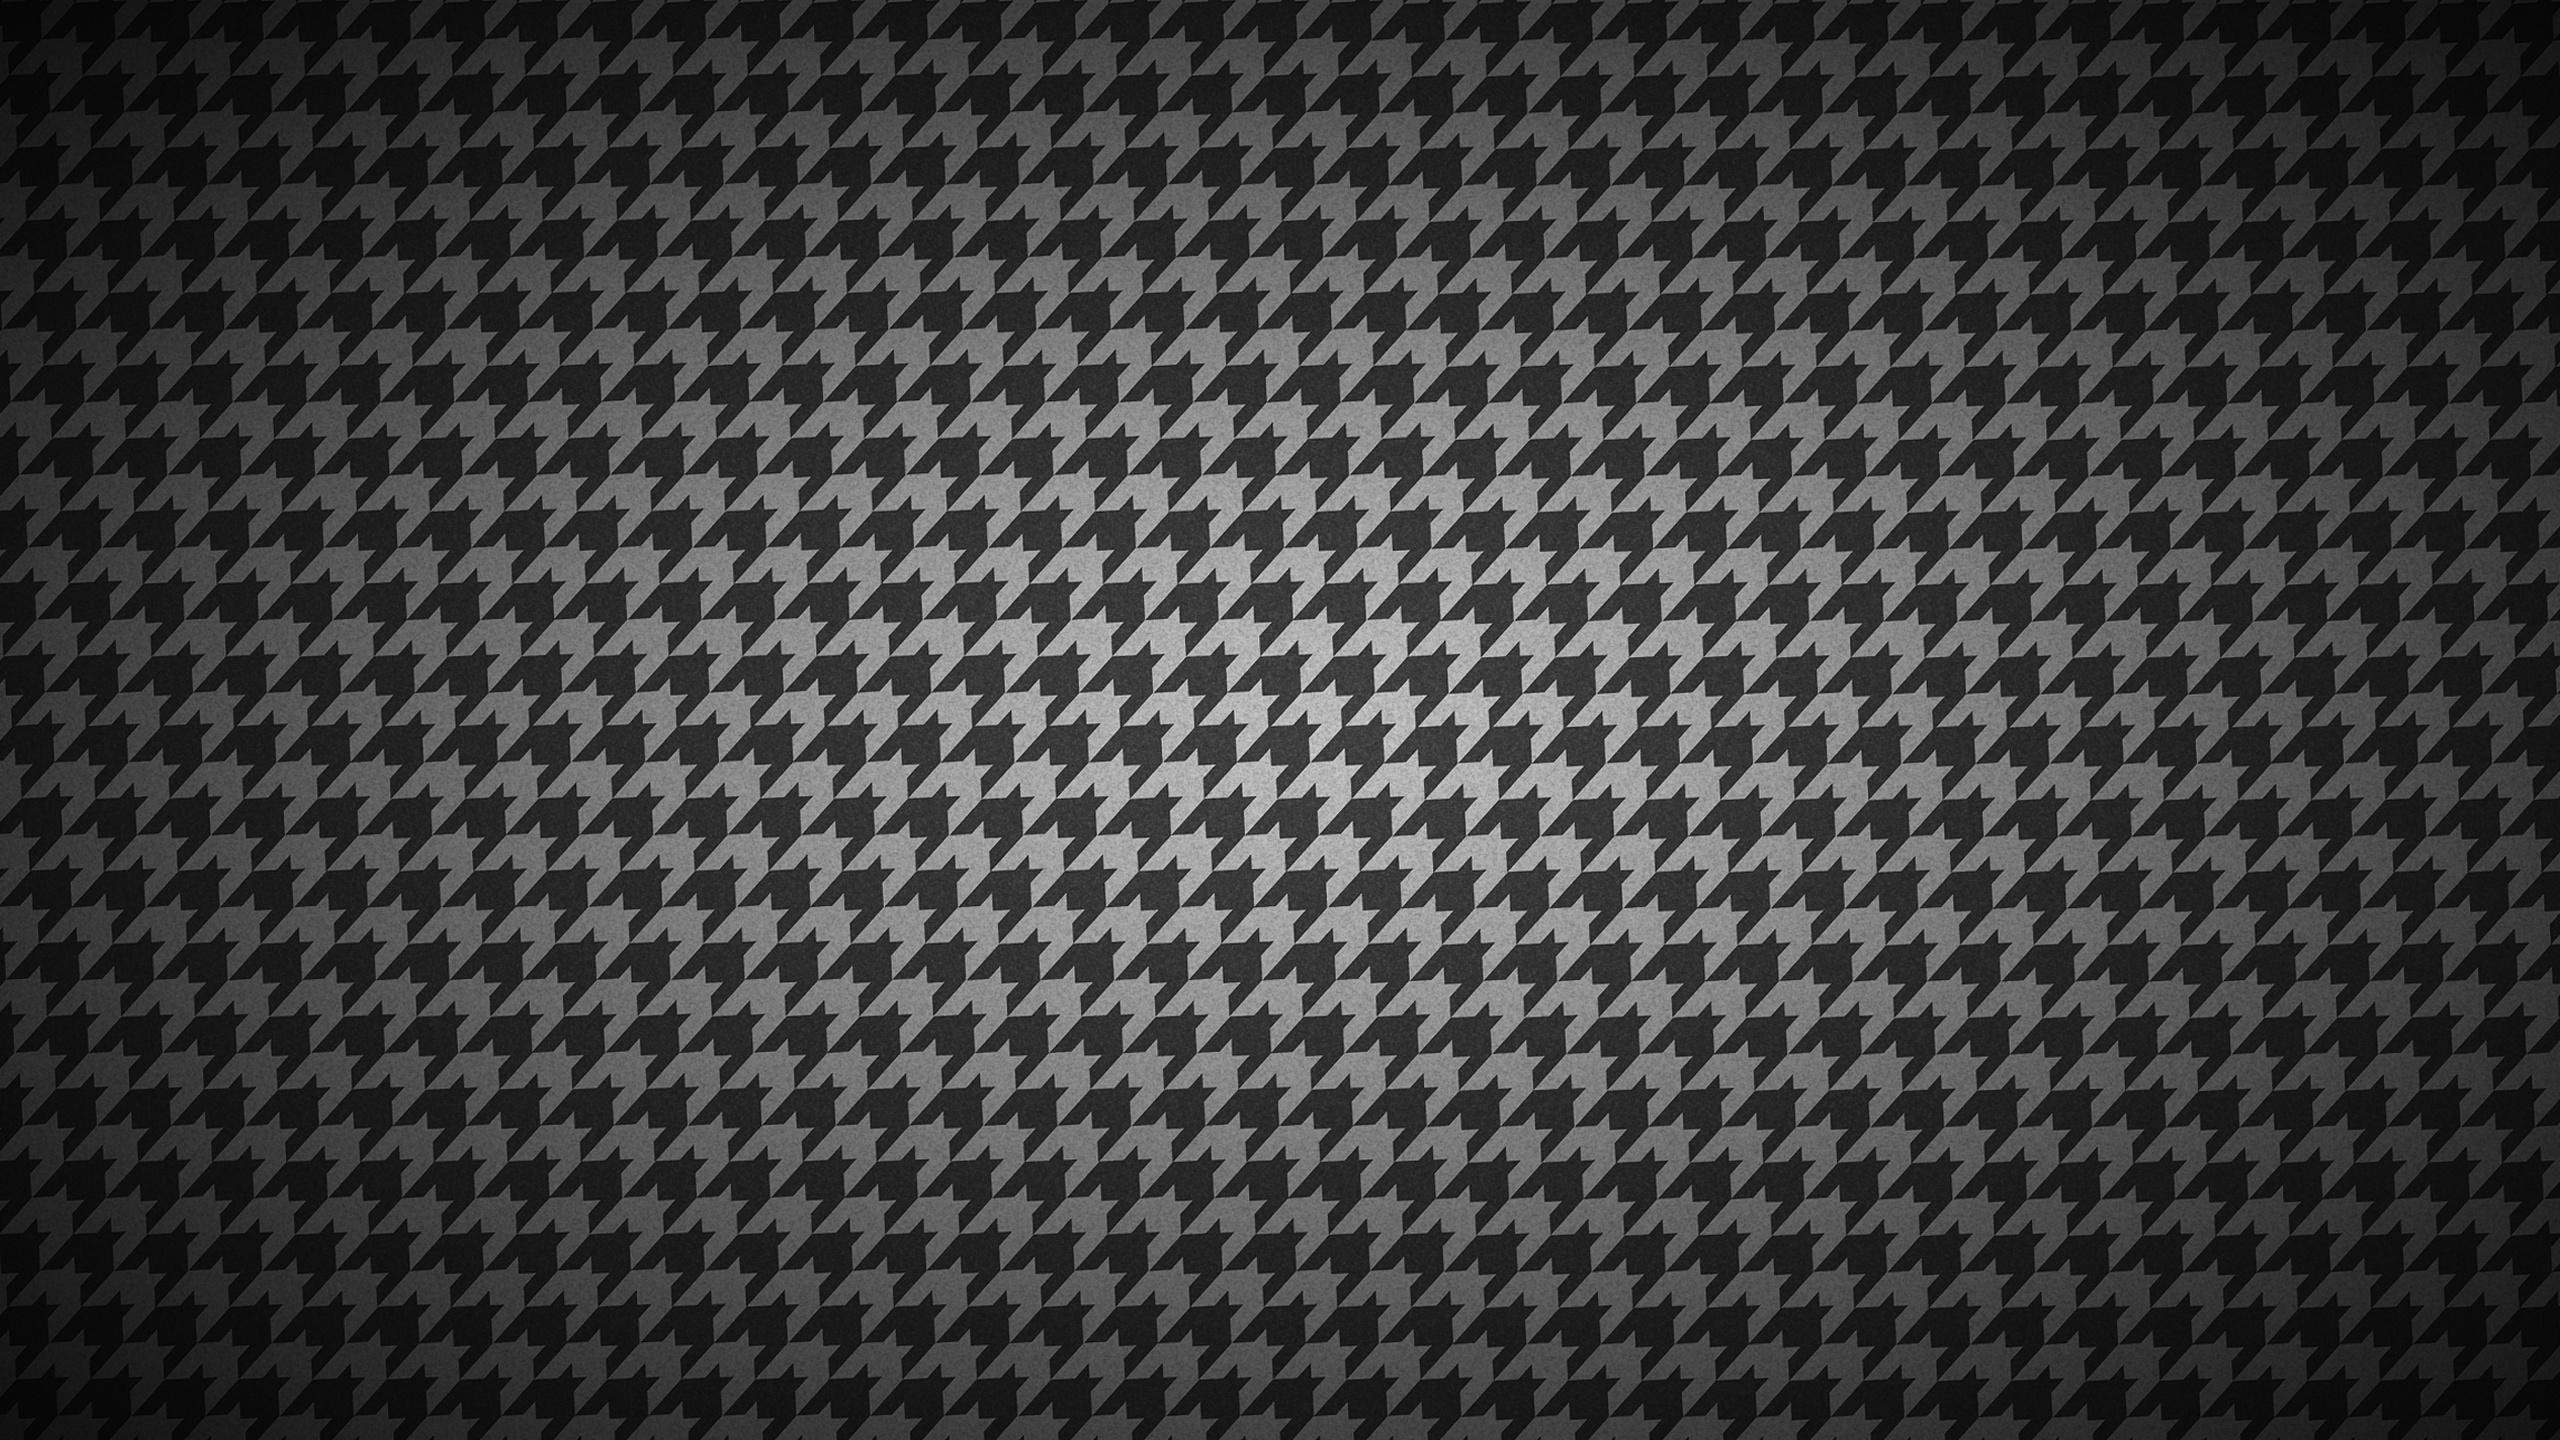 Industrial Background wallpaper - 1330063